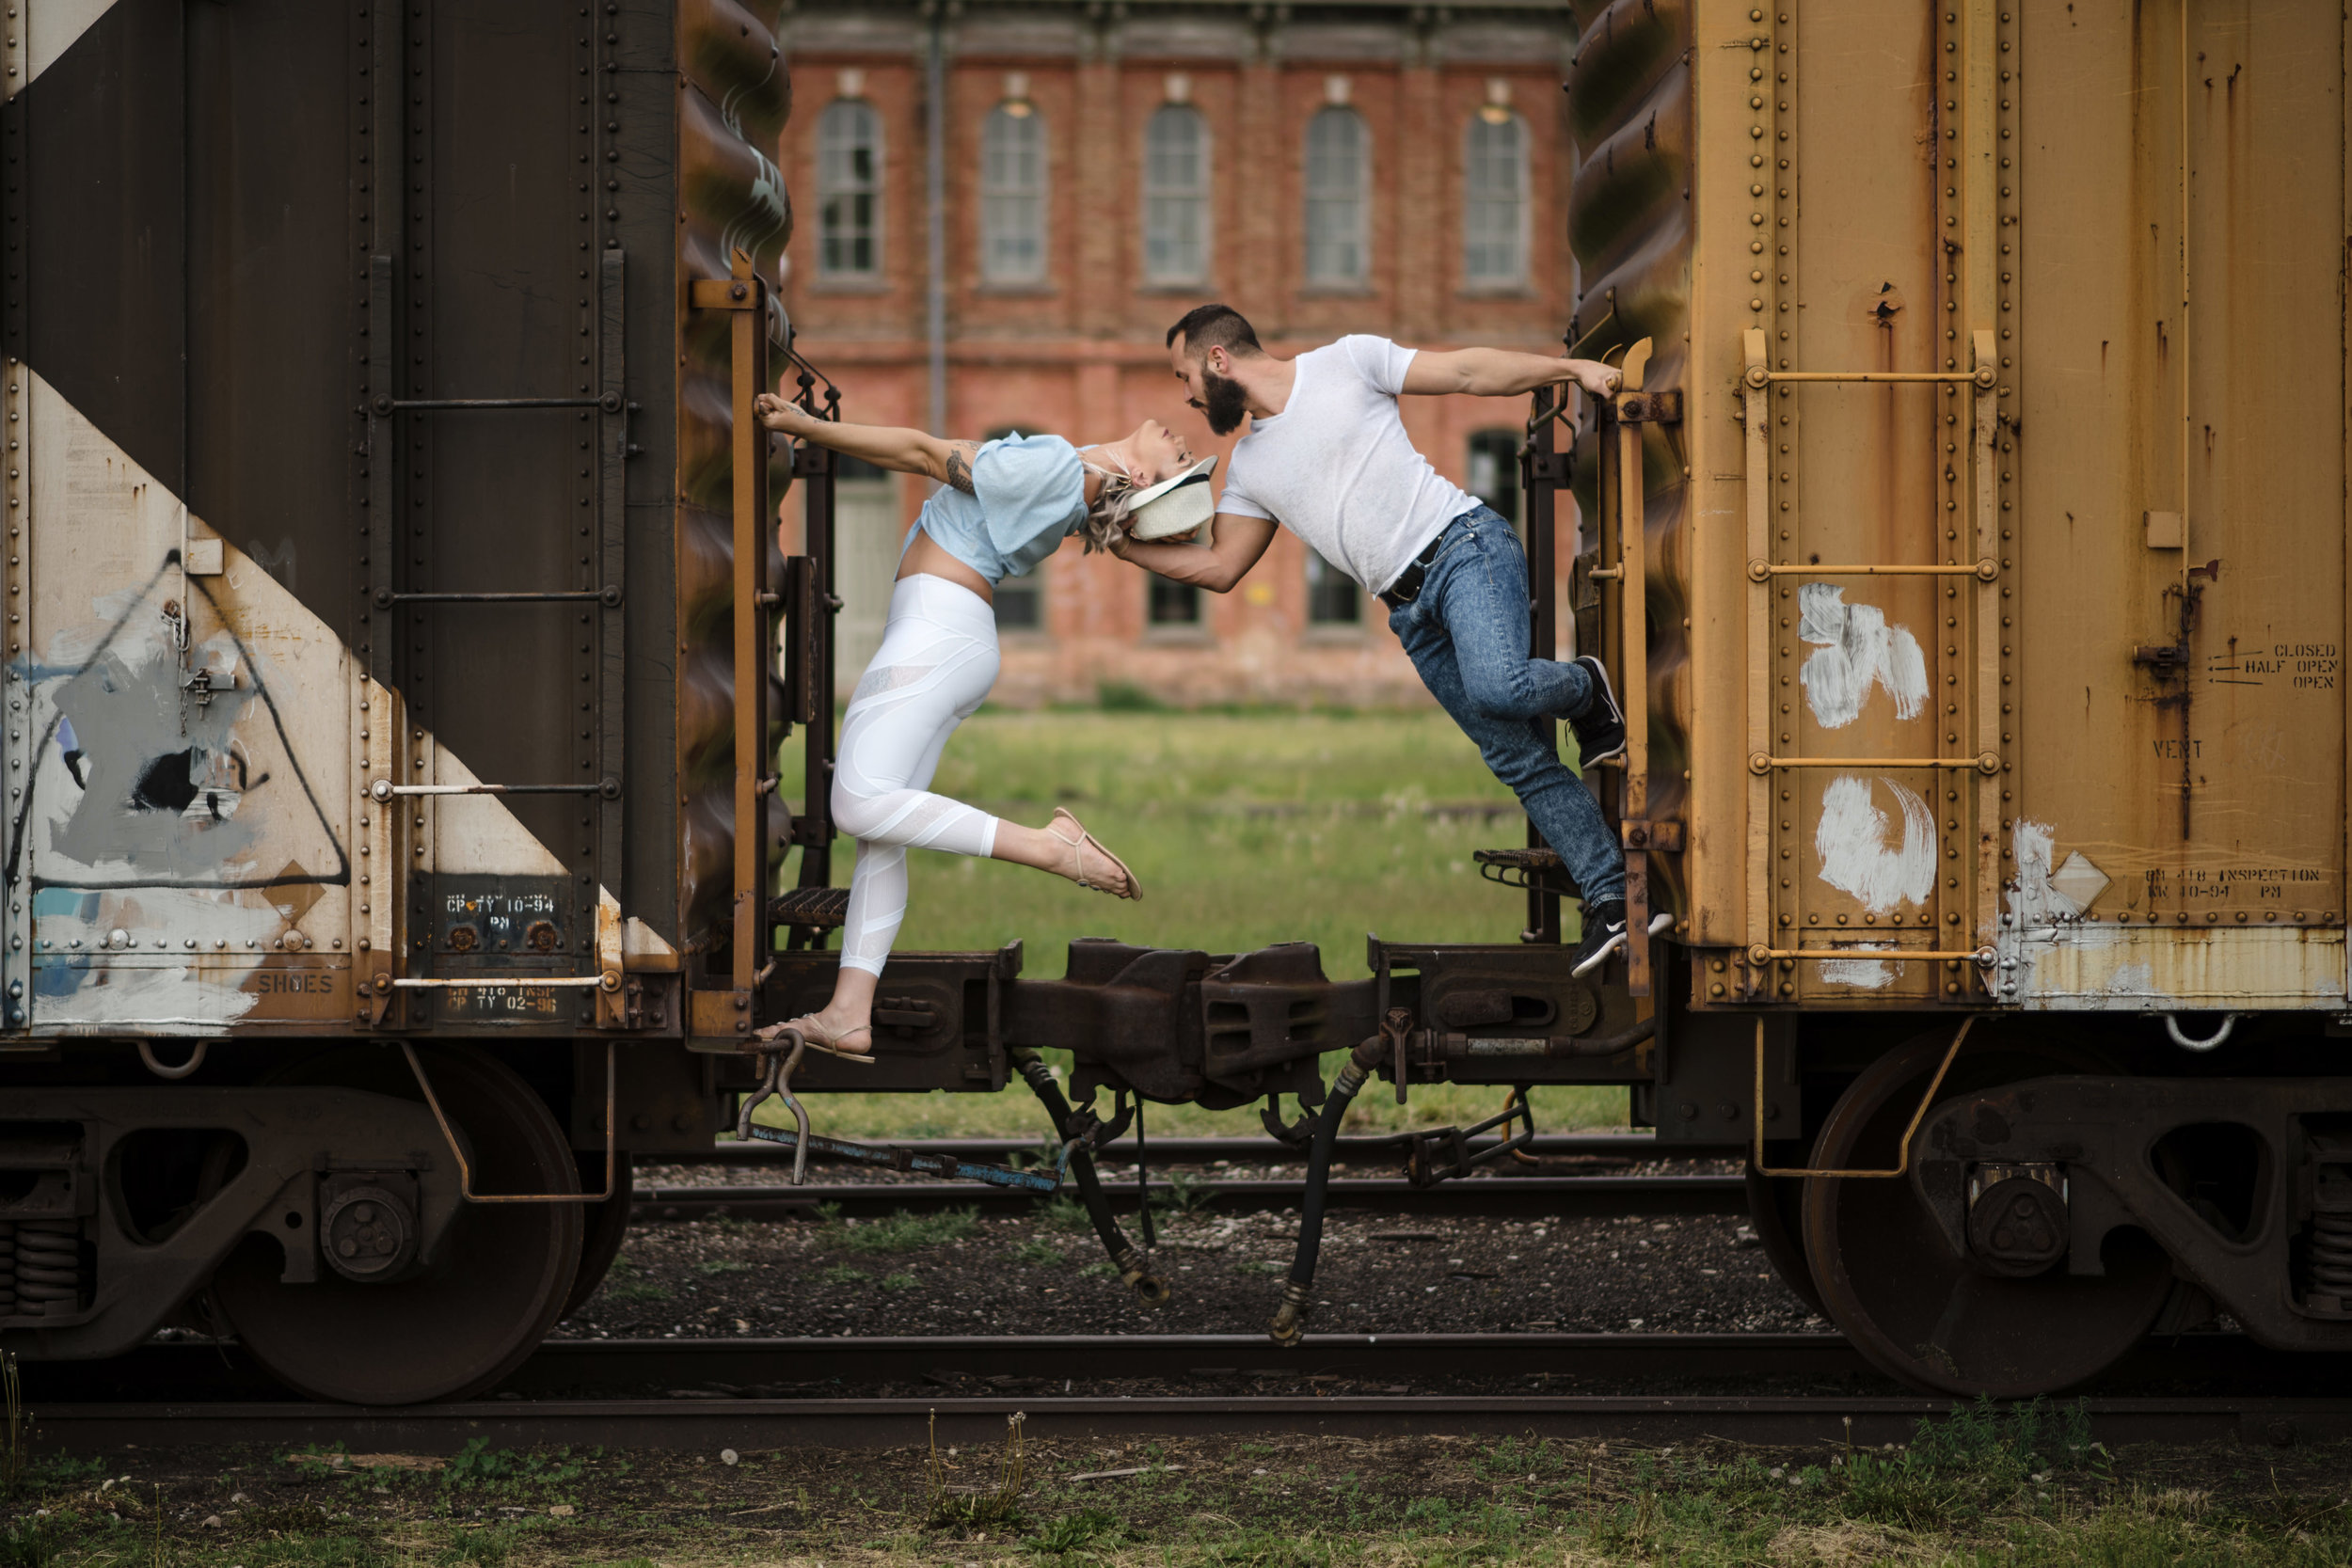 190527_Chloe&Rob_Engagement_DSC_4621.jpg